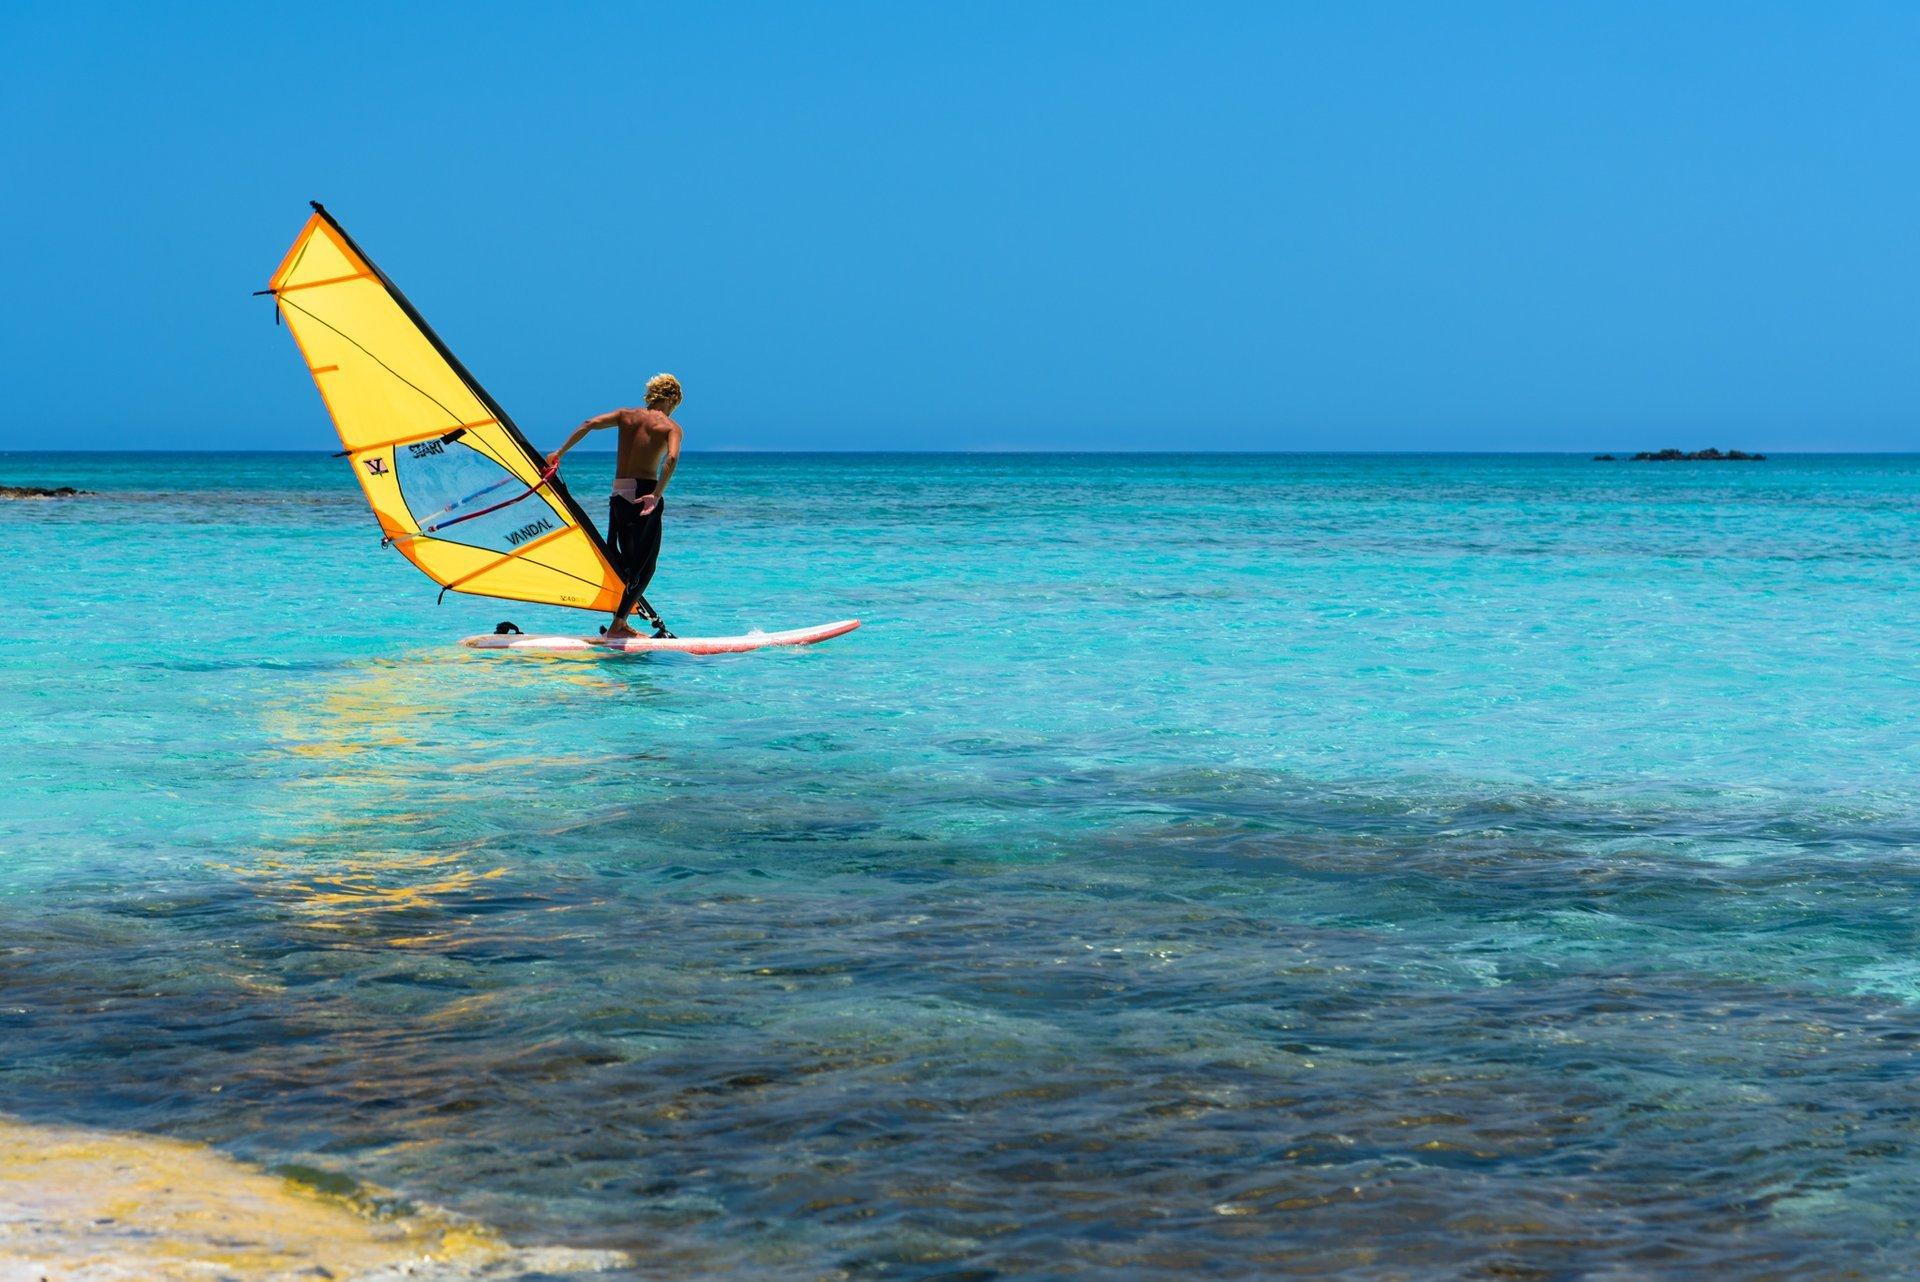 Windsurfing in Crete 2019 - Best Time